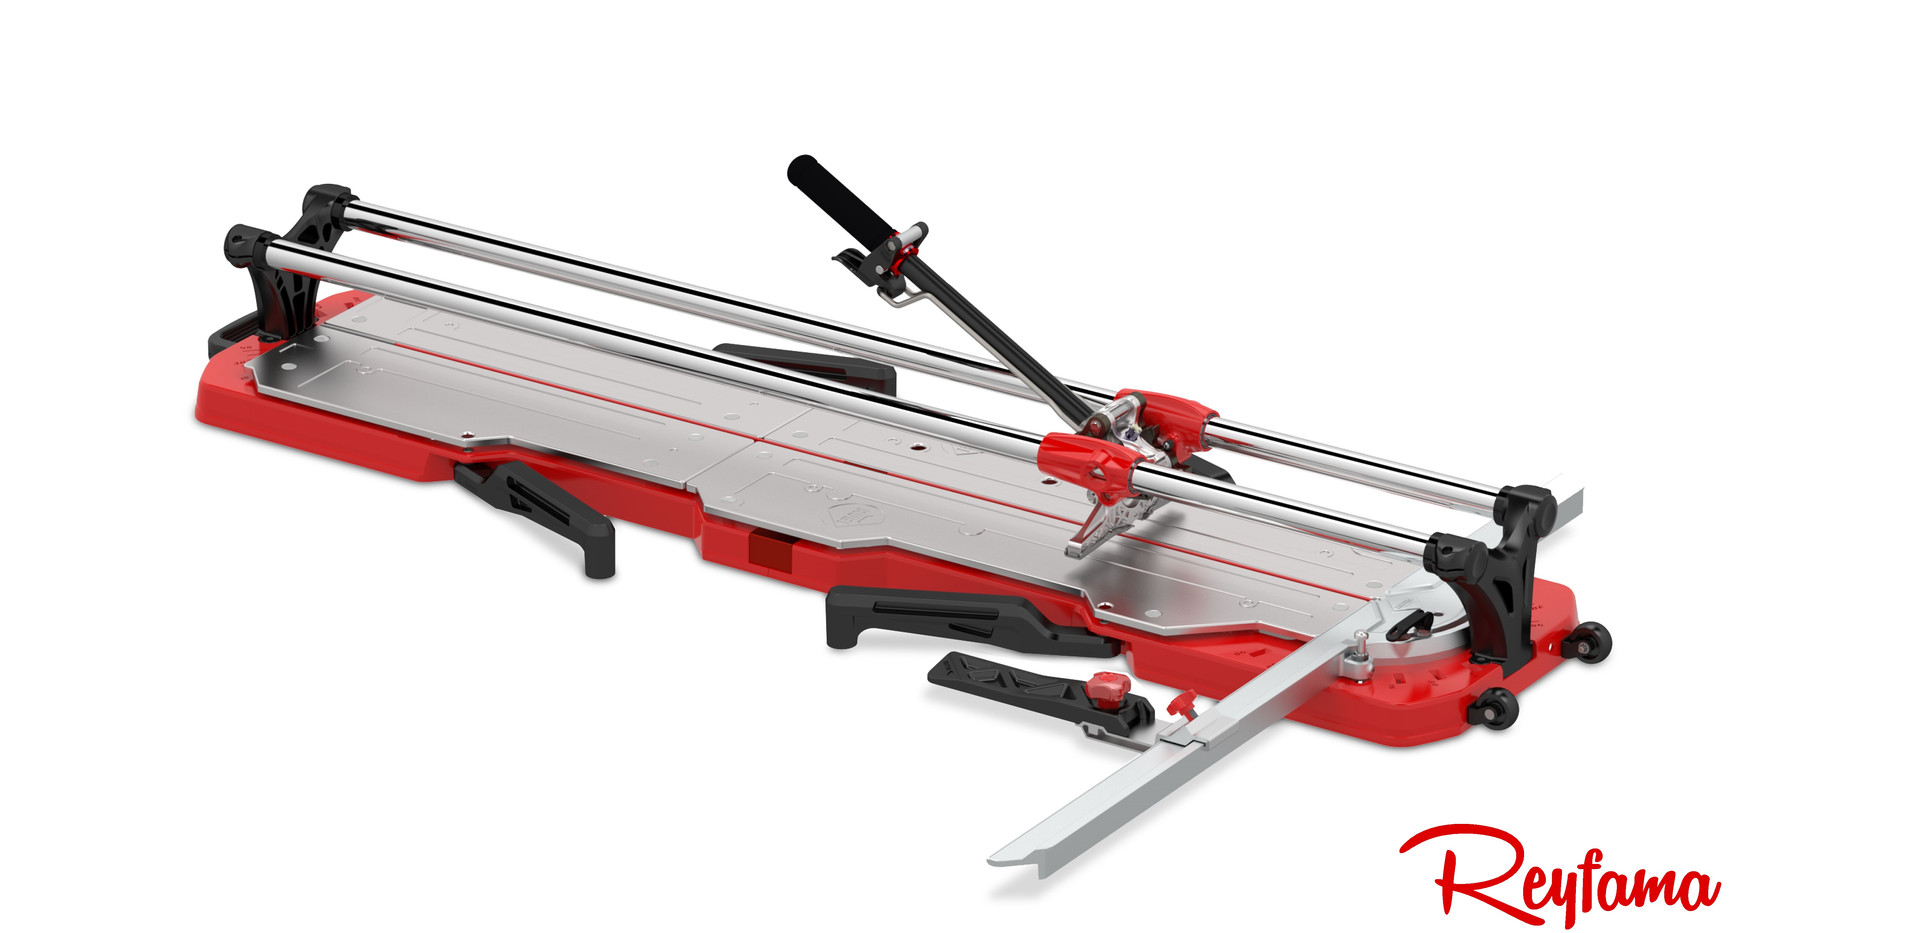 17922-cortadora-manual-tx-1250-max-inch-